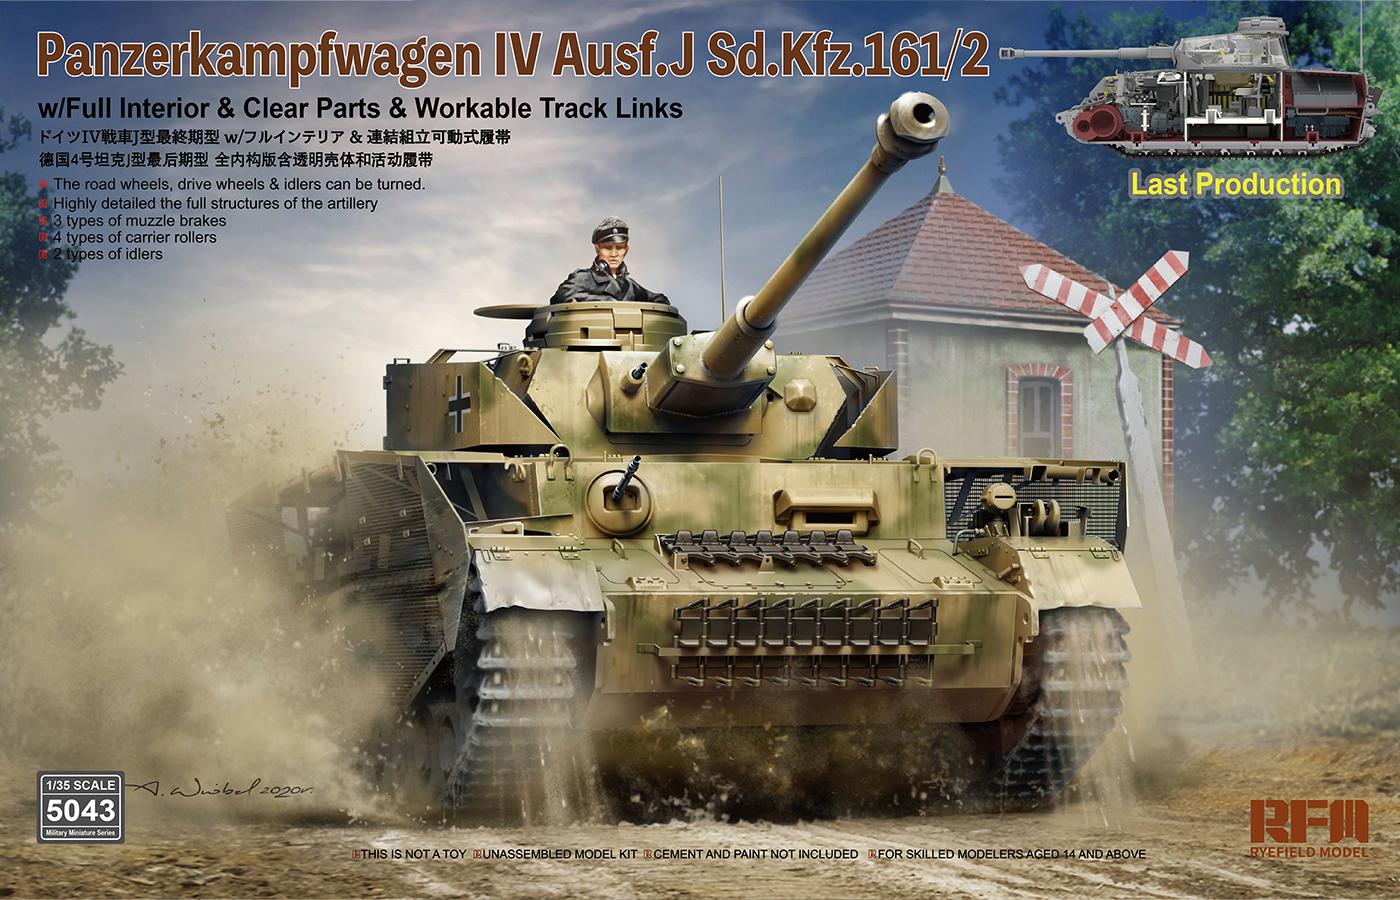 RM-5043 Panzerkampfwagen IV Ausf.J Sd.Kfz.161/2 (w/full interior&clear parts&workle track links)